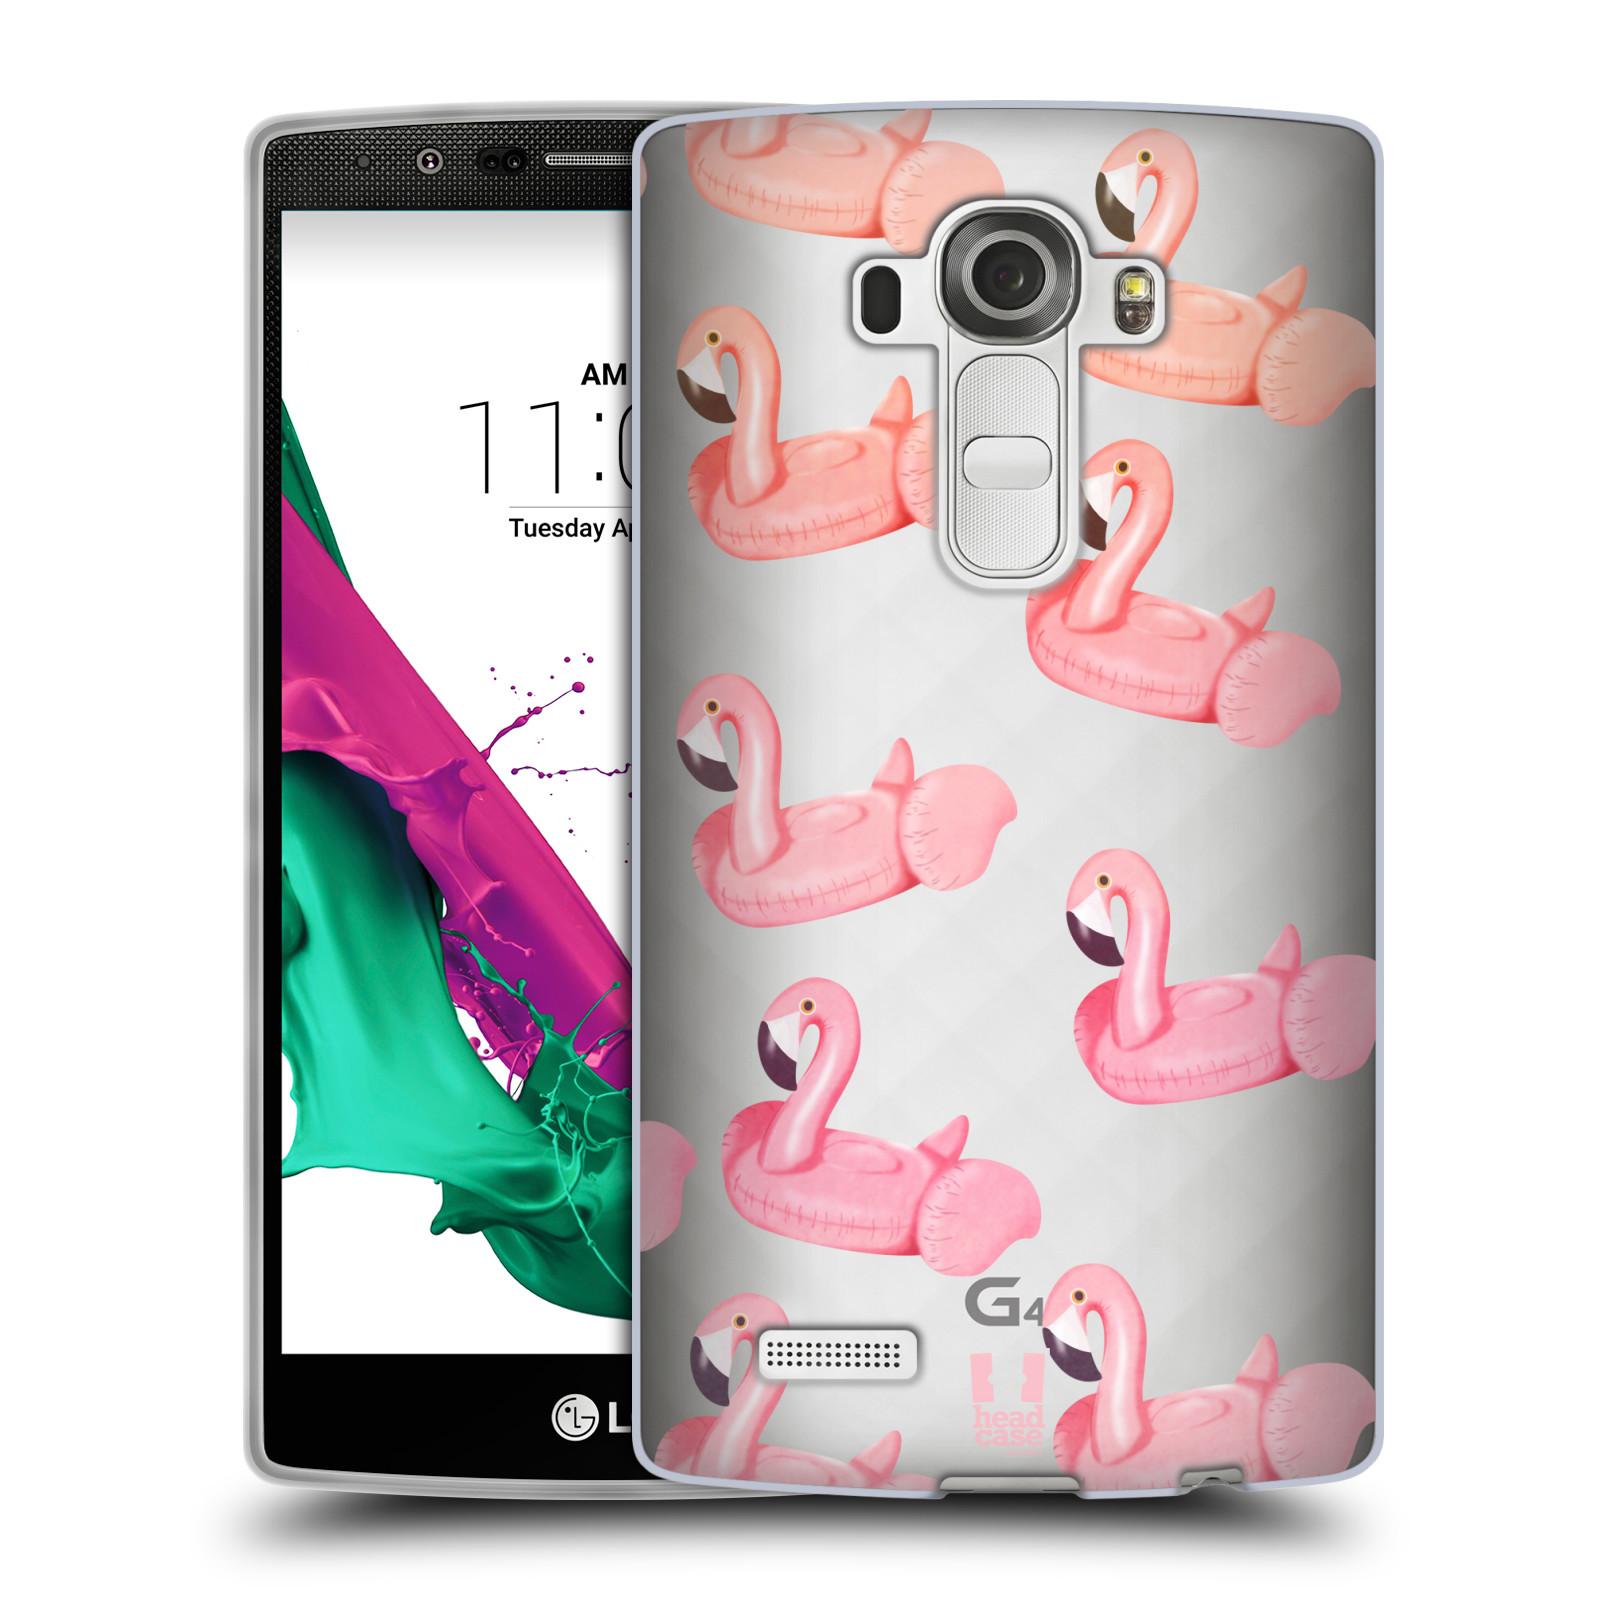 Silikonové pouzdro na mobil LG G4 - Head Case - Kruh plaměňák